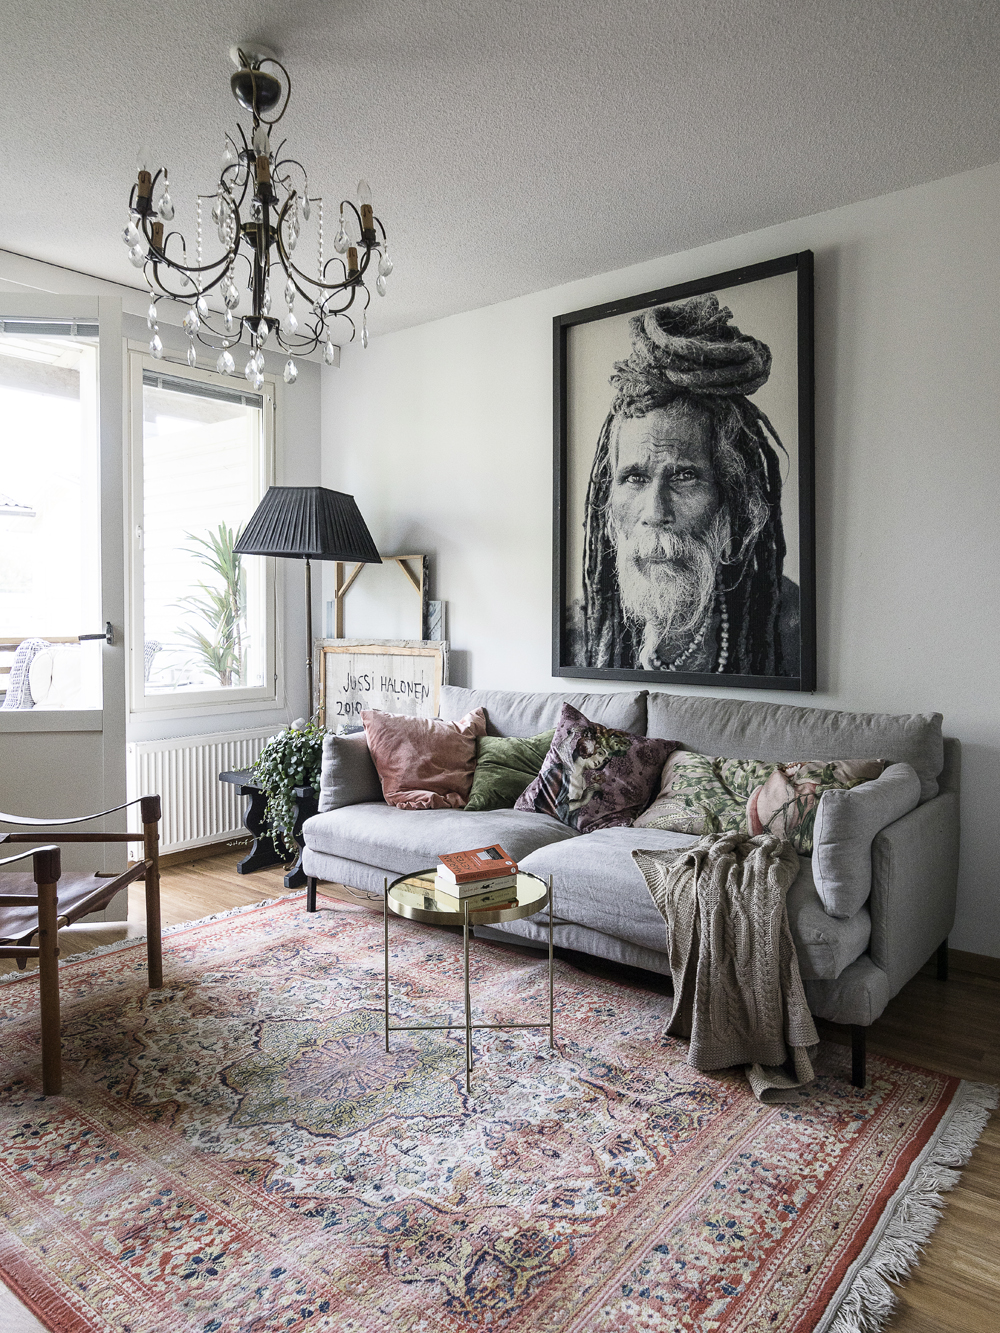 sisustus, sisustaminen, koti, interior, scandinavian home, inredning, nordic home, Visualaddict, koti, hem, home, visualaddictfrida, valokuvaaja, Frida Steiner, finnishhome, myhome,